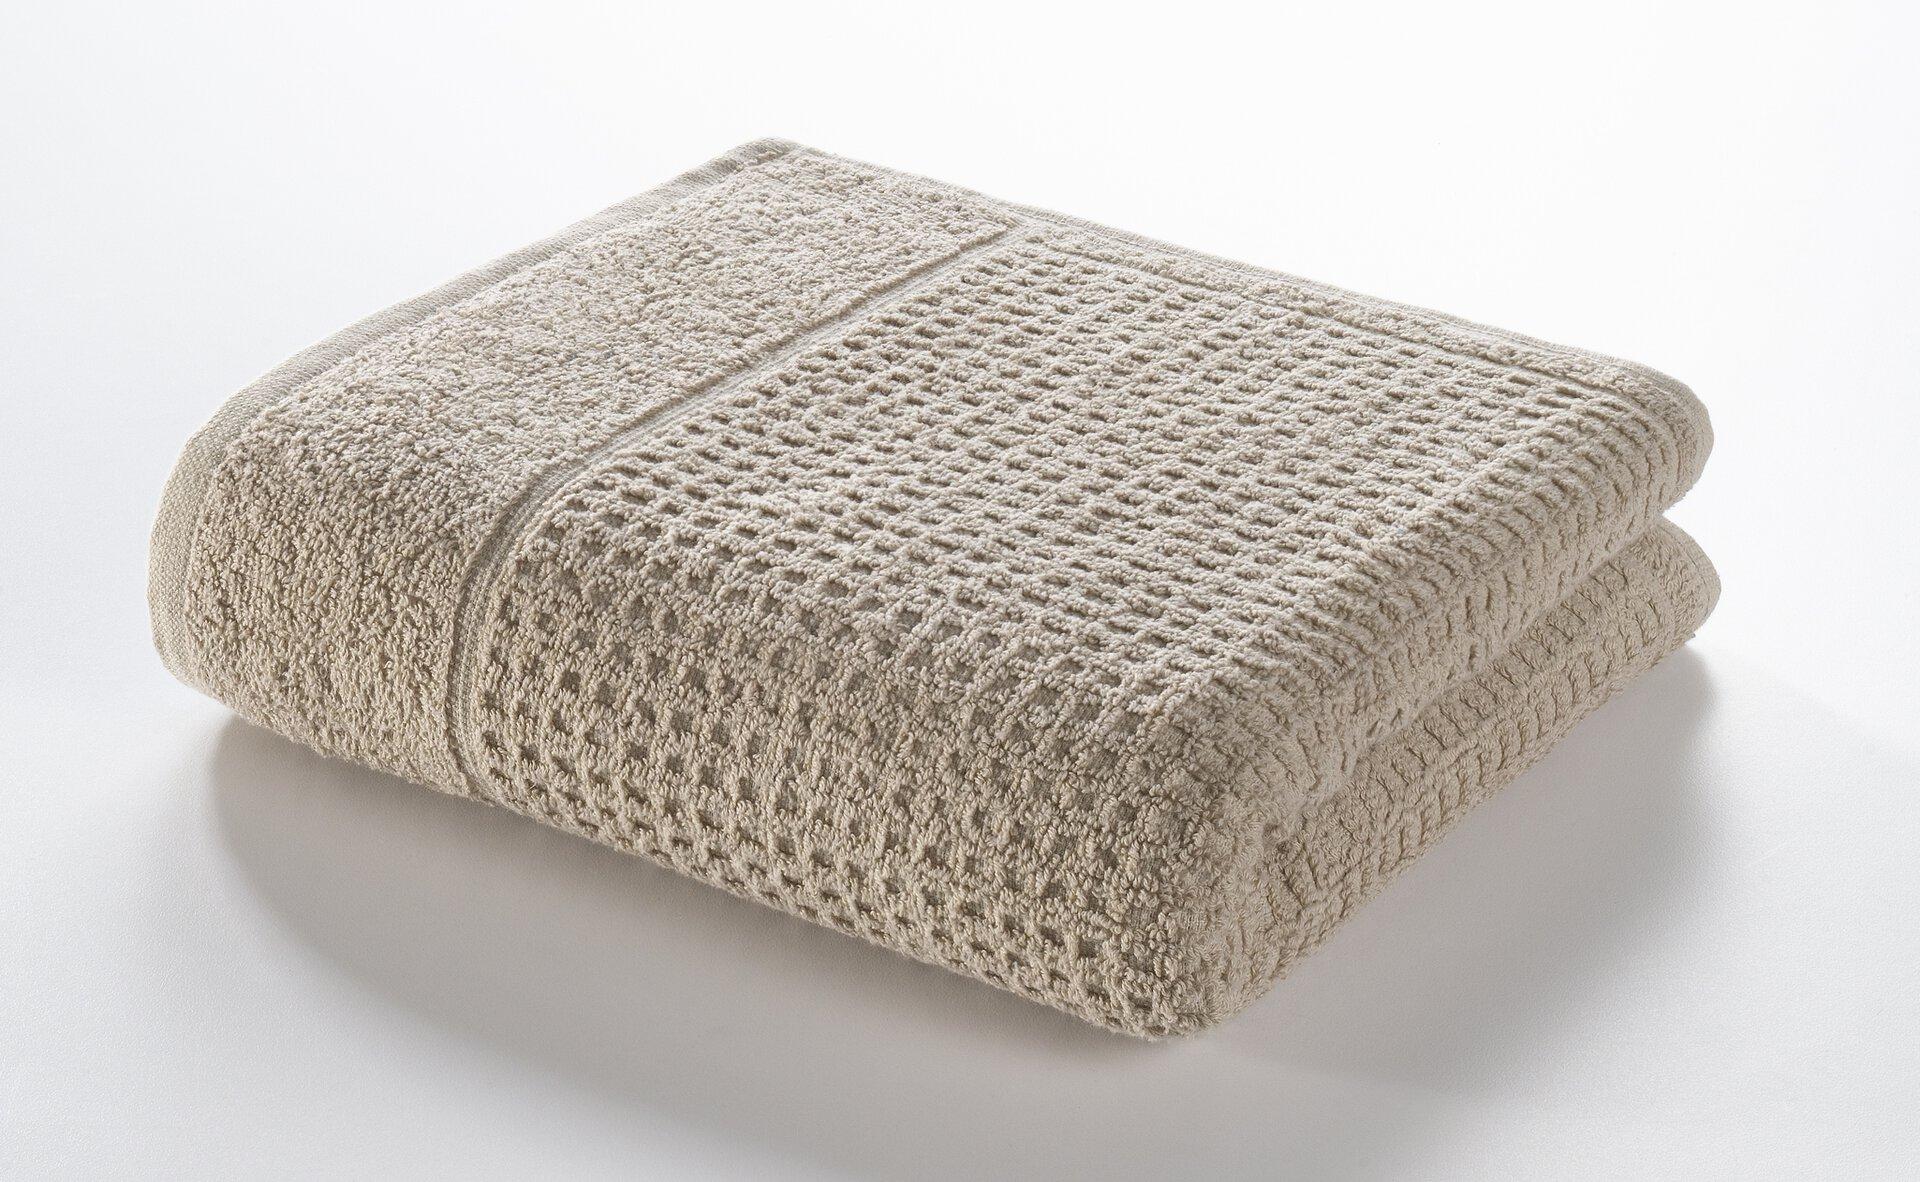 Handtuch Faro Casa Nova Textil beige 50 x 100 cm